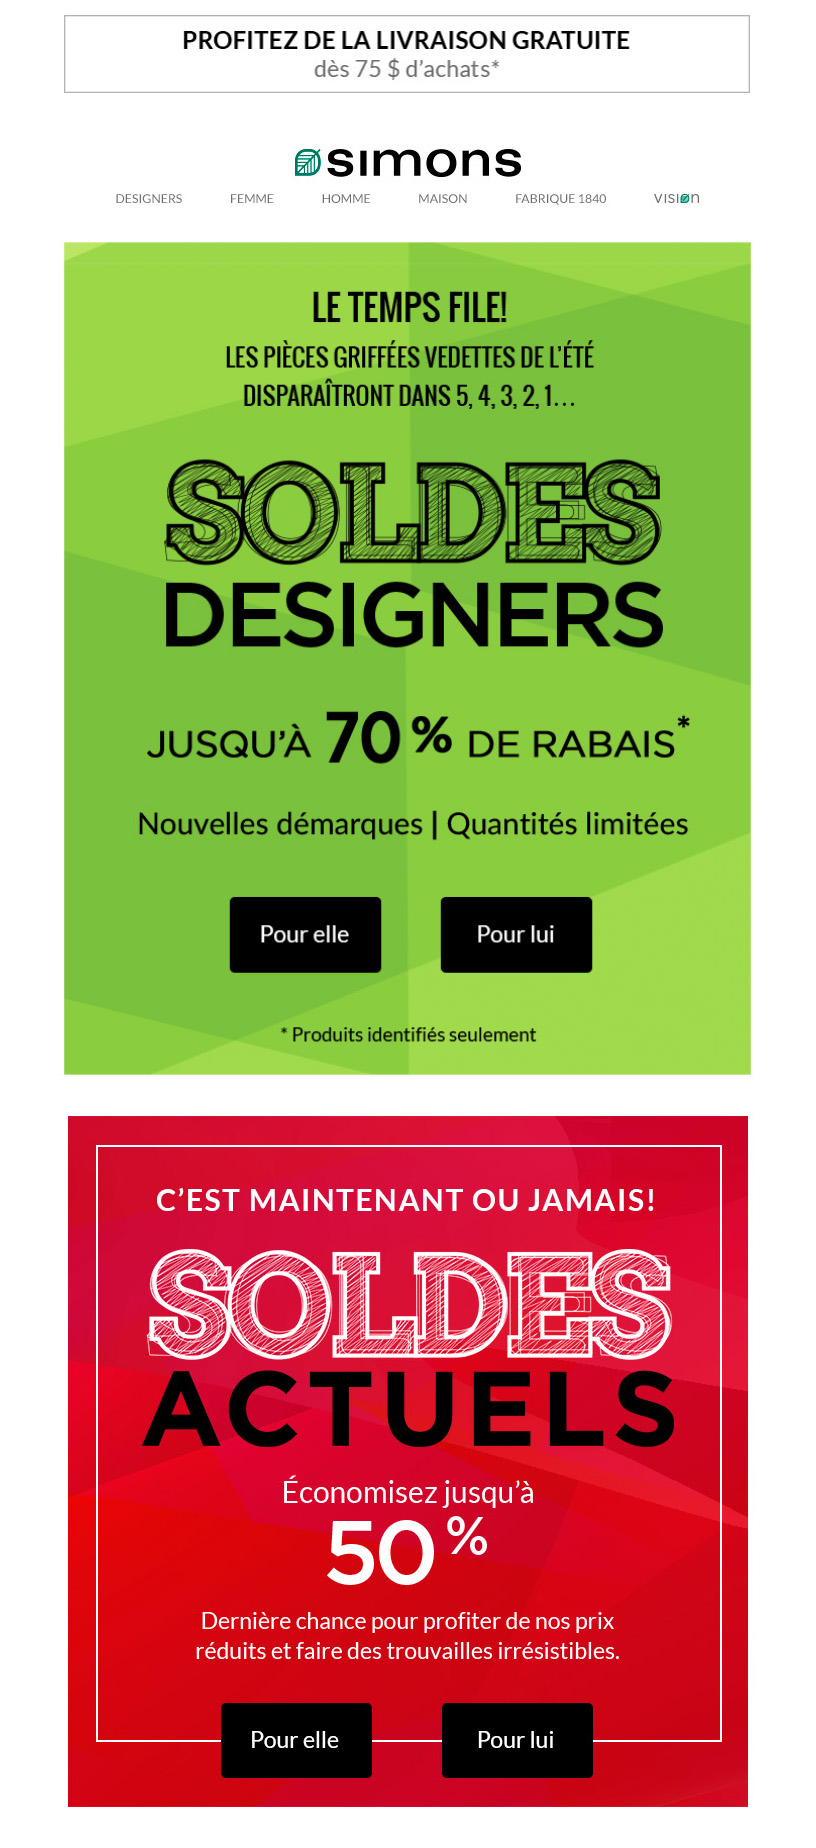 Adieu, Soldes Designers...